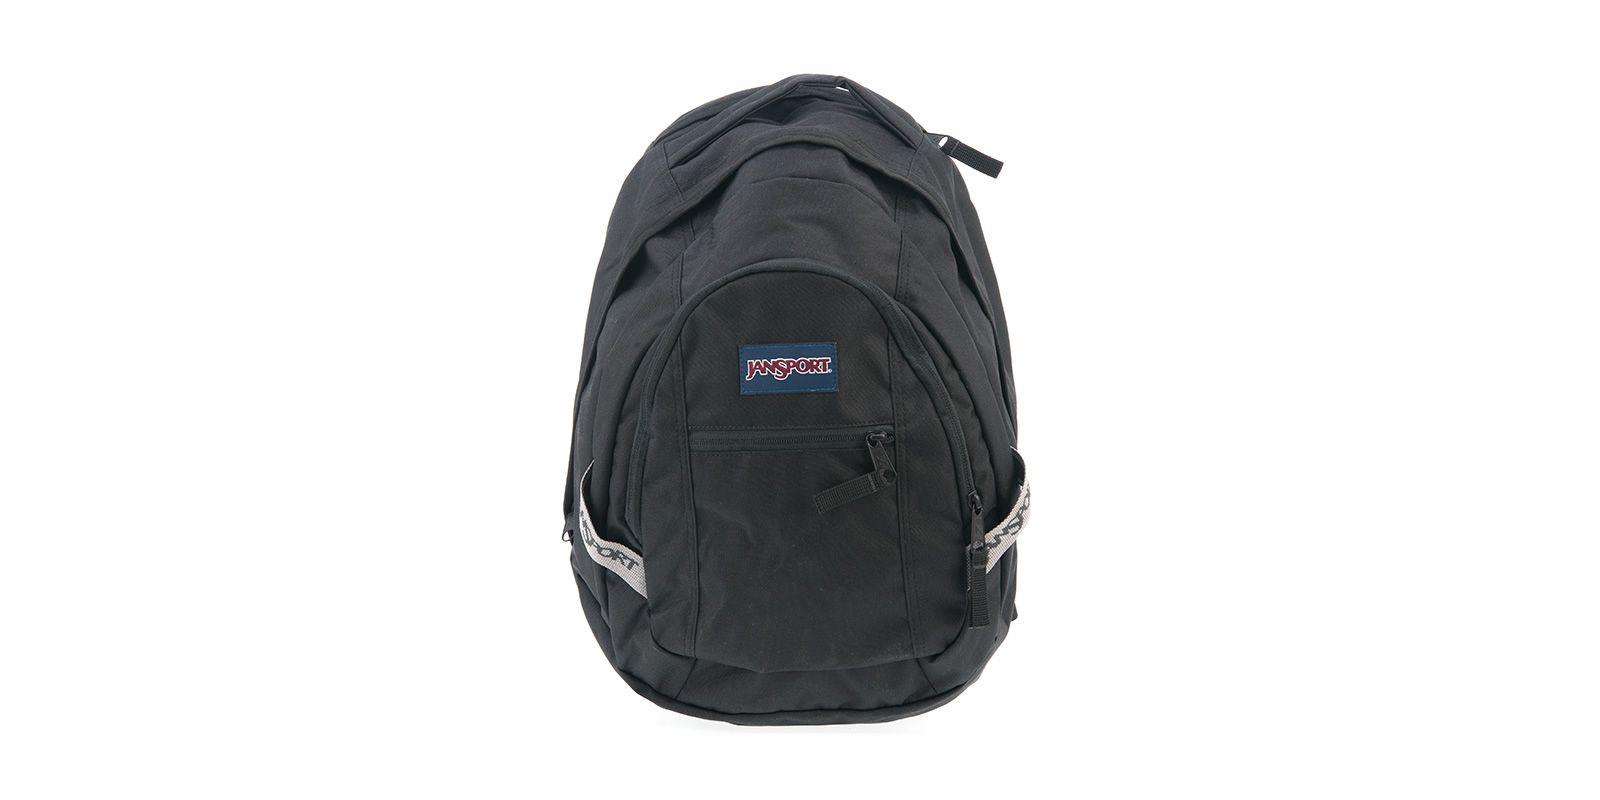 1e8906db6d72 JANSPORT TRINITY UNISEX BACKPACK - Premier Sport #JanSport #Backpack ...